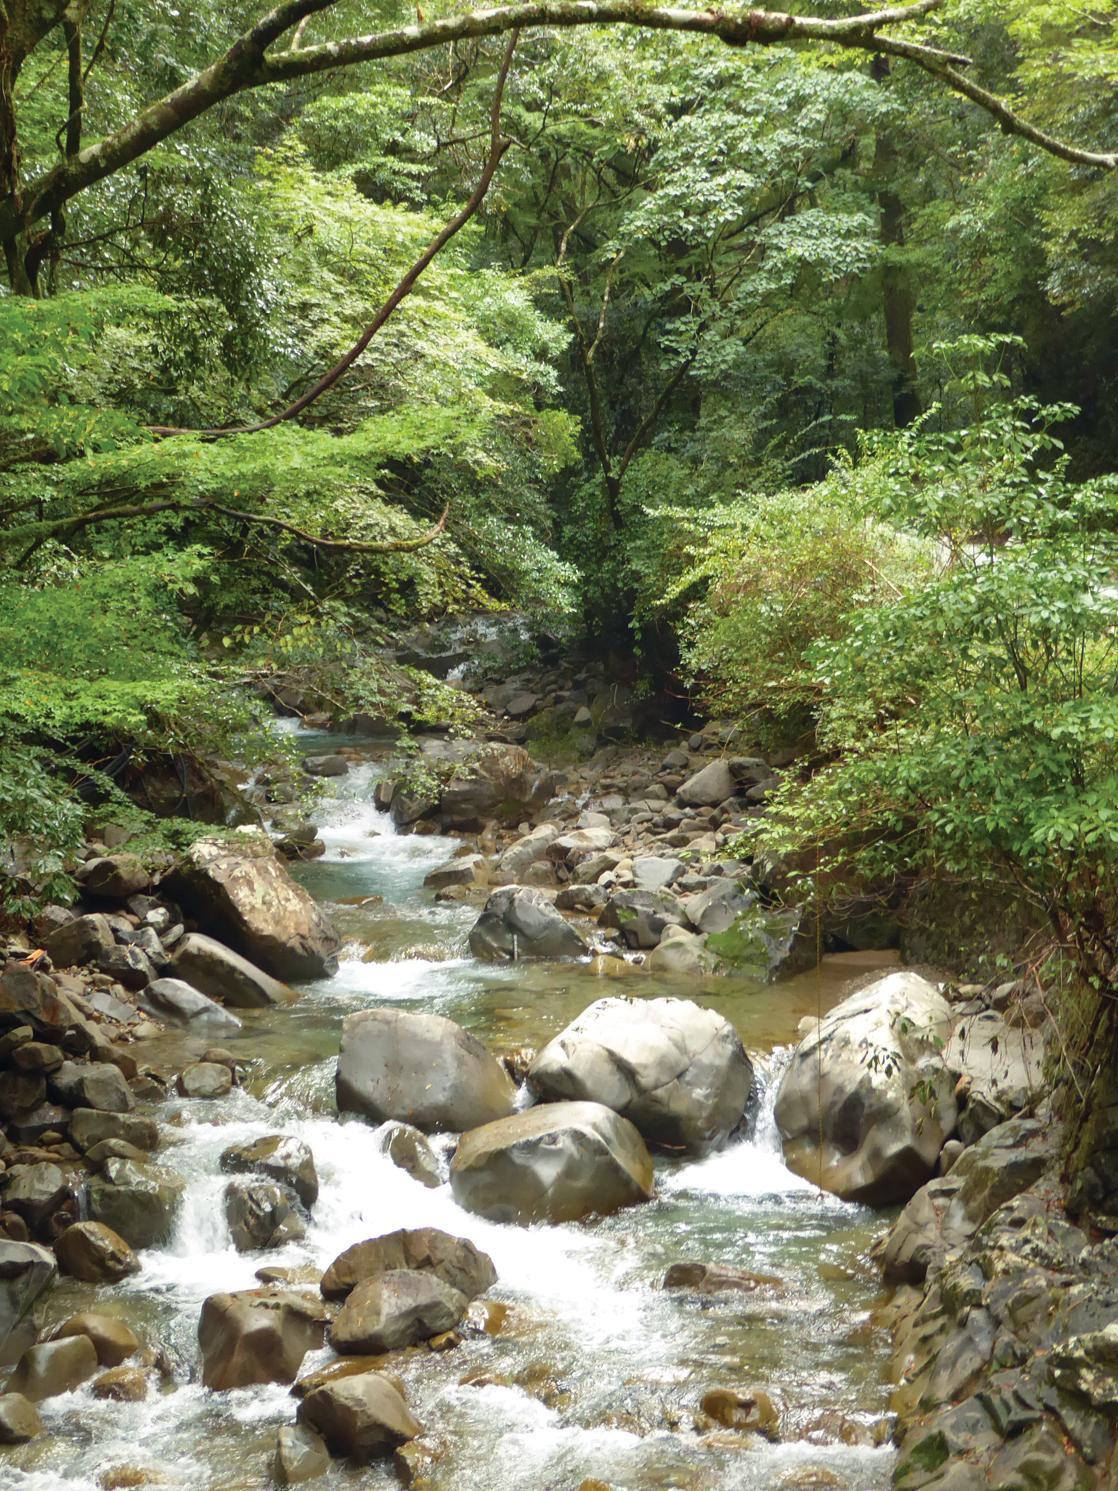 Mountain stream rushing with water